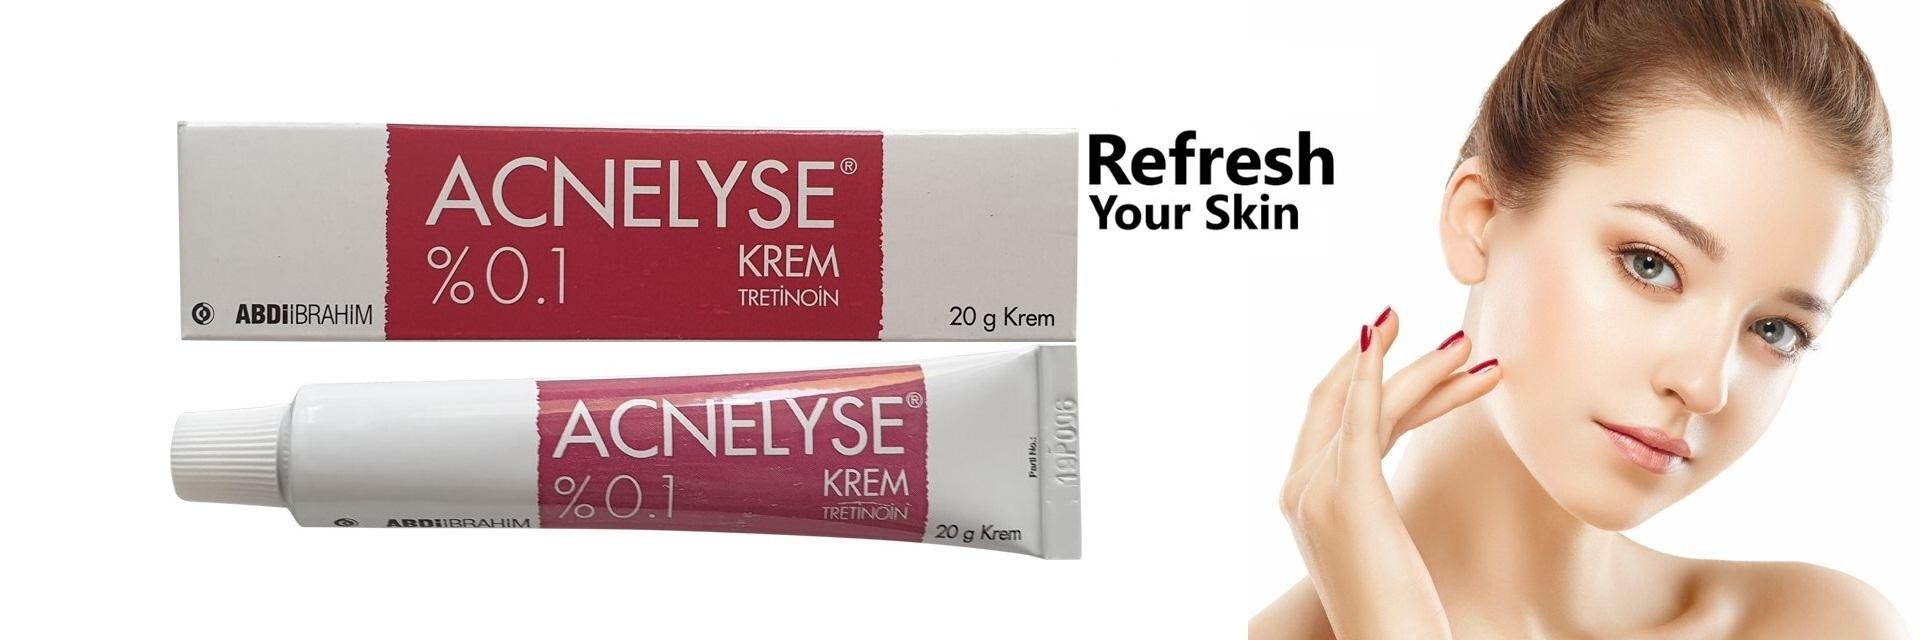 acnelyse-cream-tretinoin-anti-wrinkle-cream